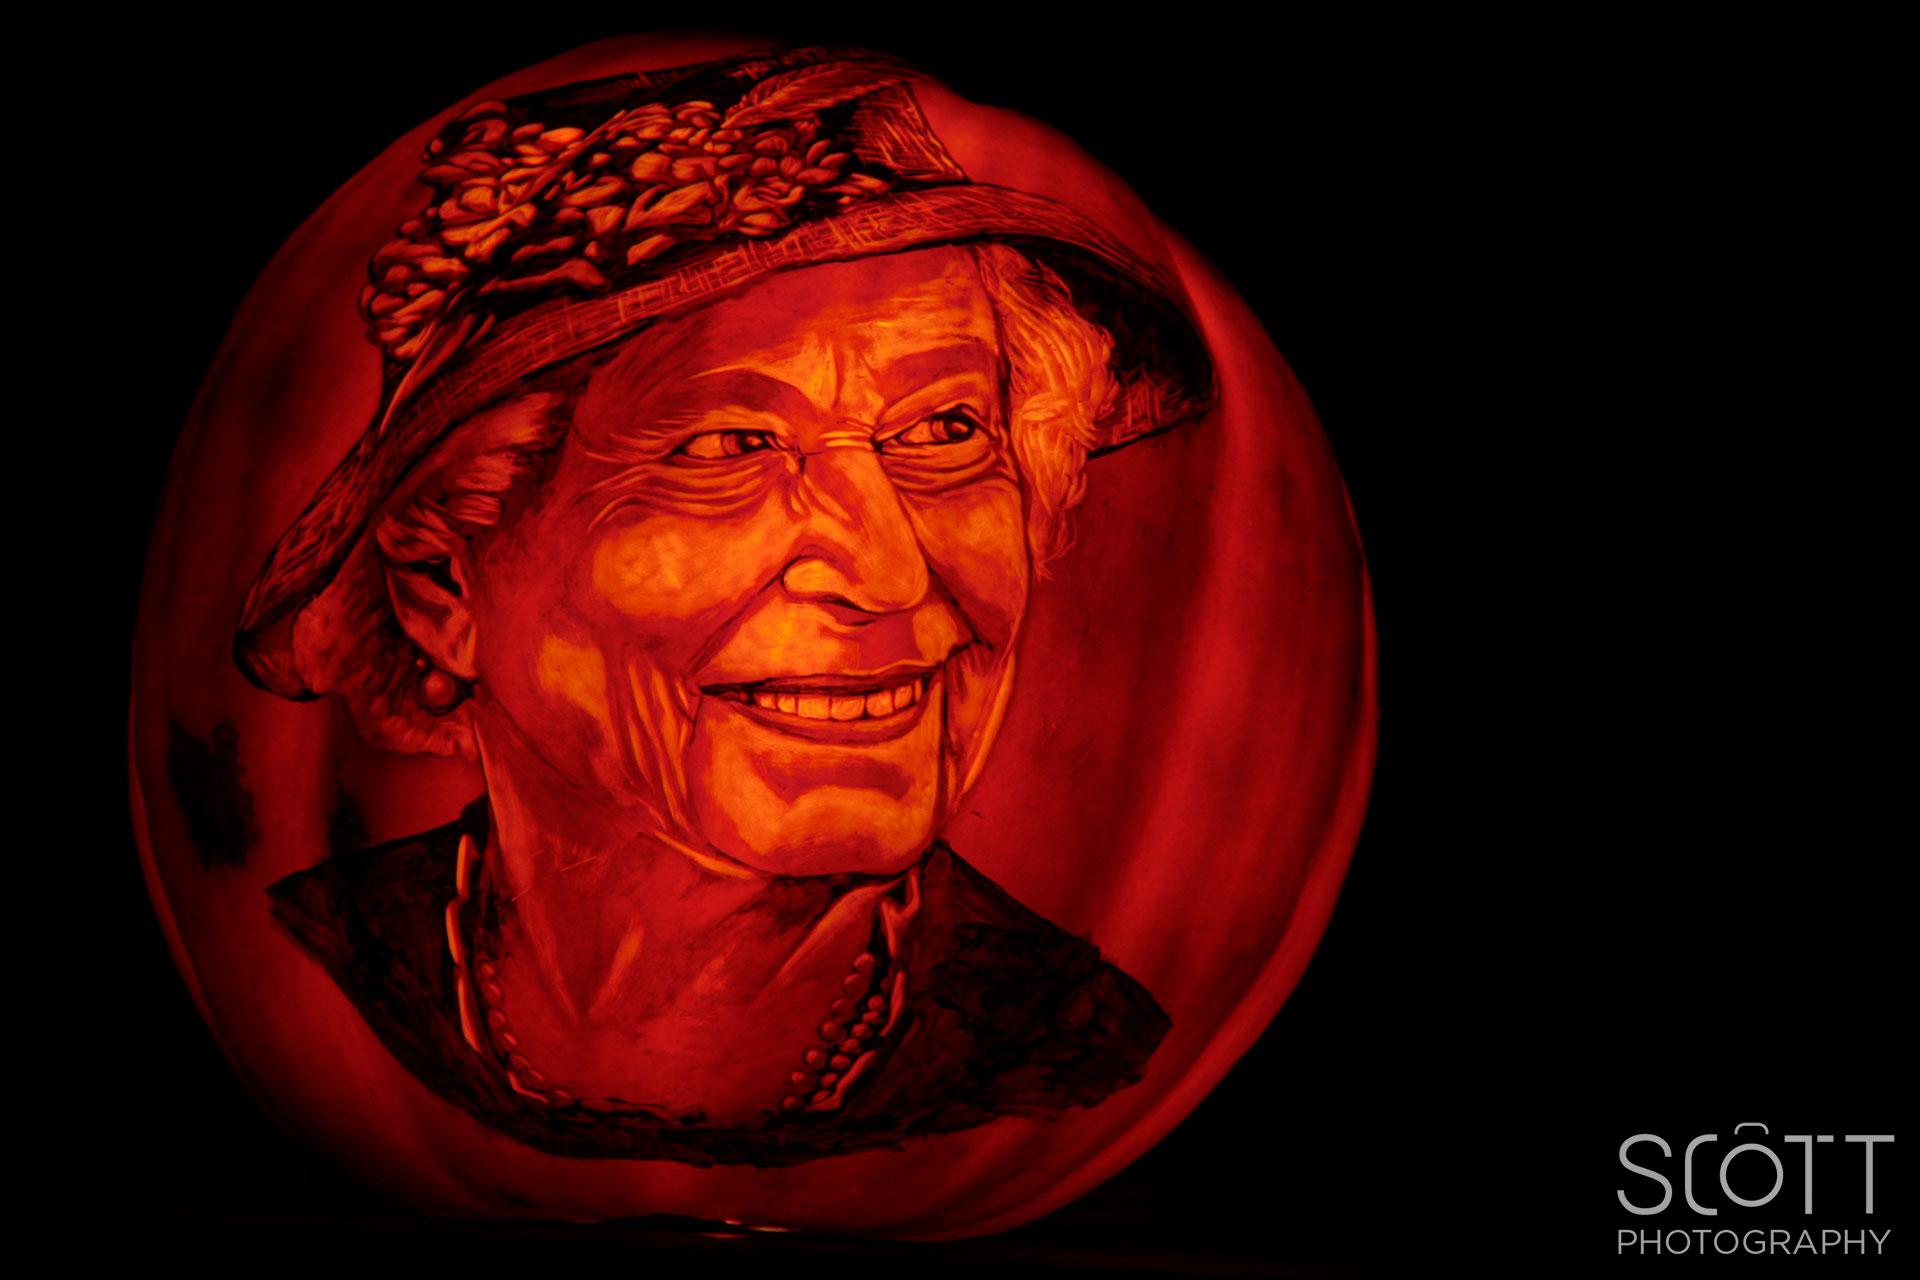 Roger williams jack o lantern spectacular scott